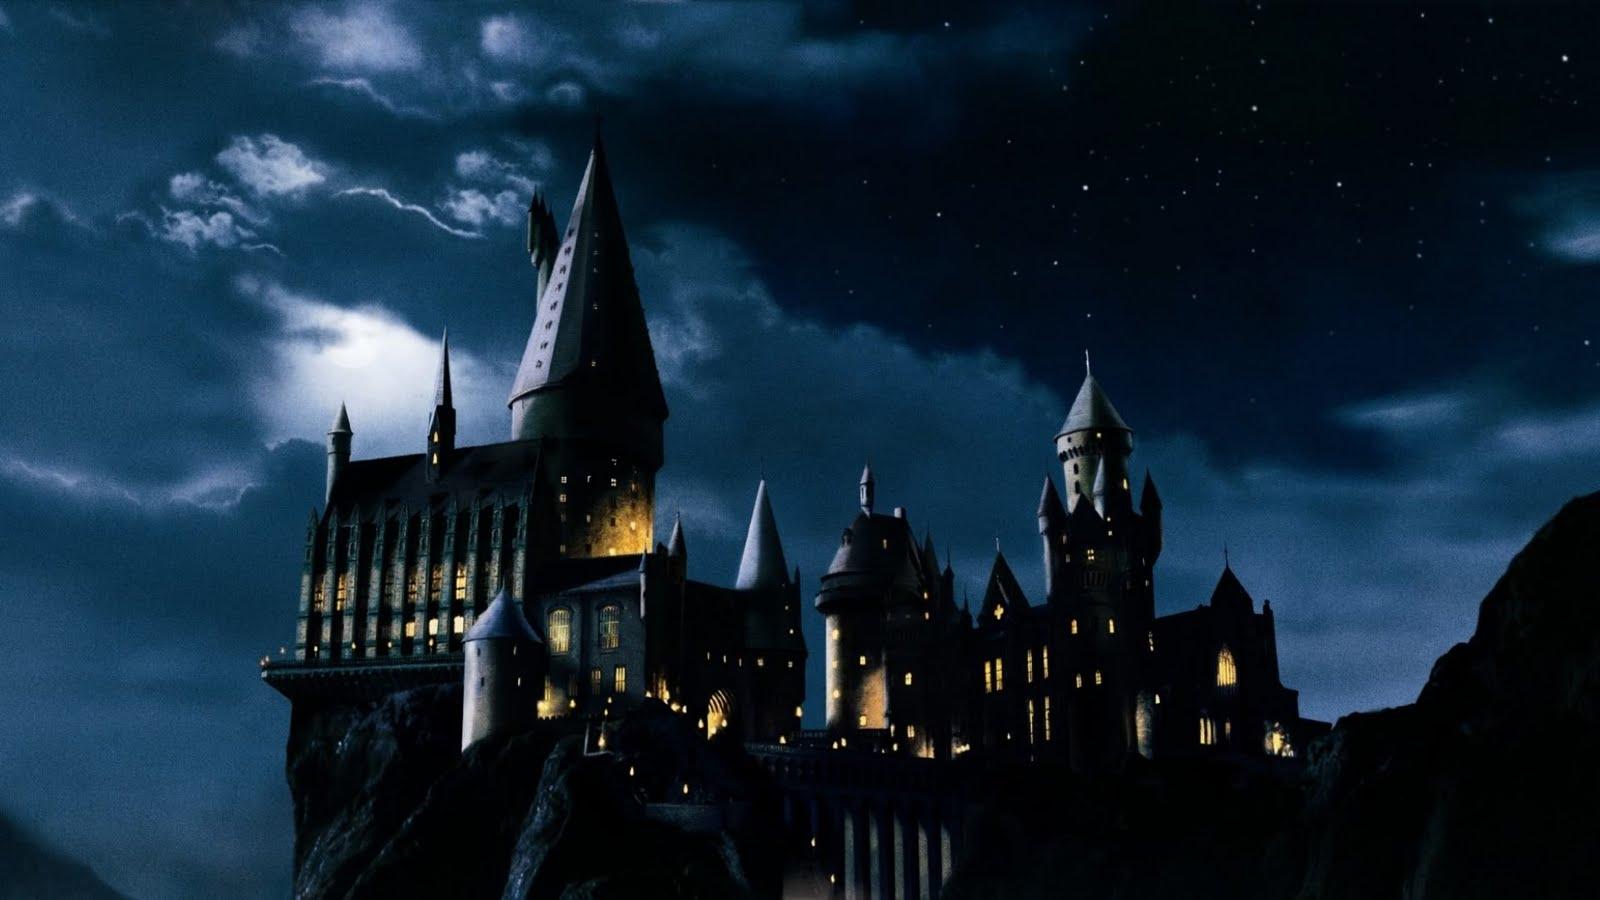 Best Wallpaper Harry Potter Ipad - harry-potter-14  Gallery_168393.jpg